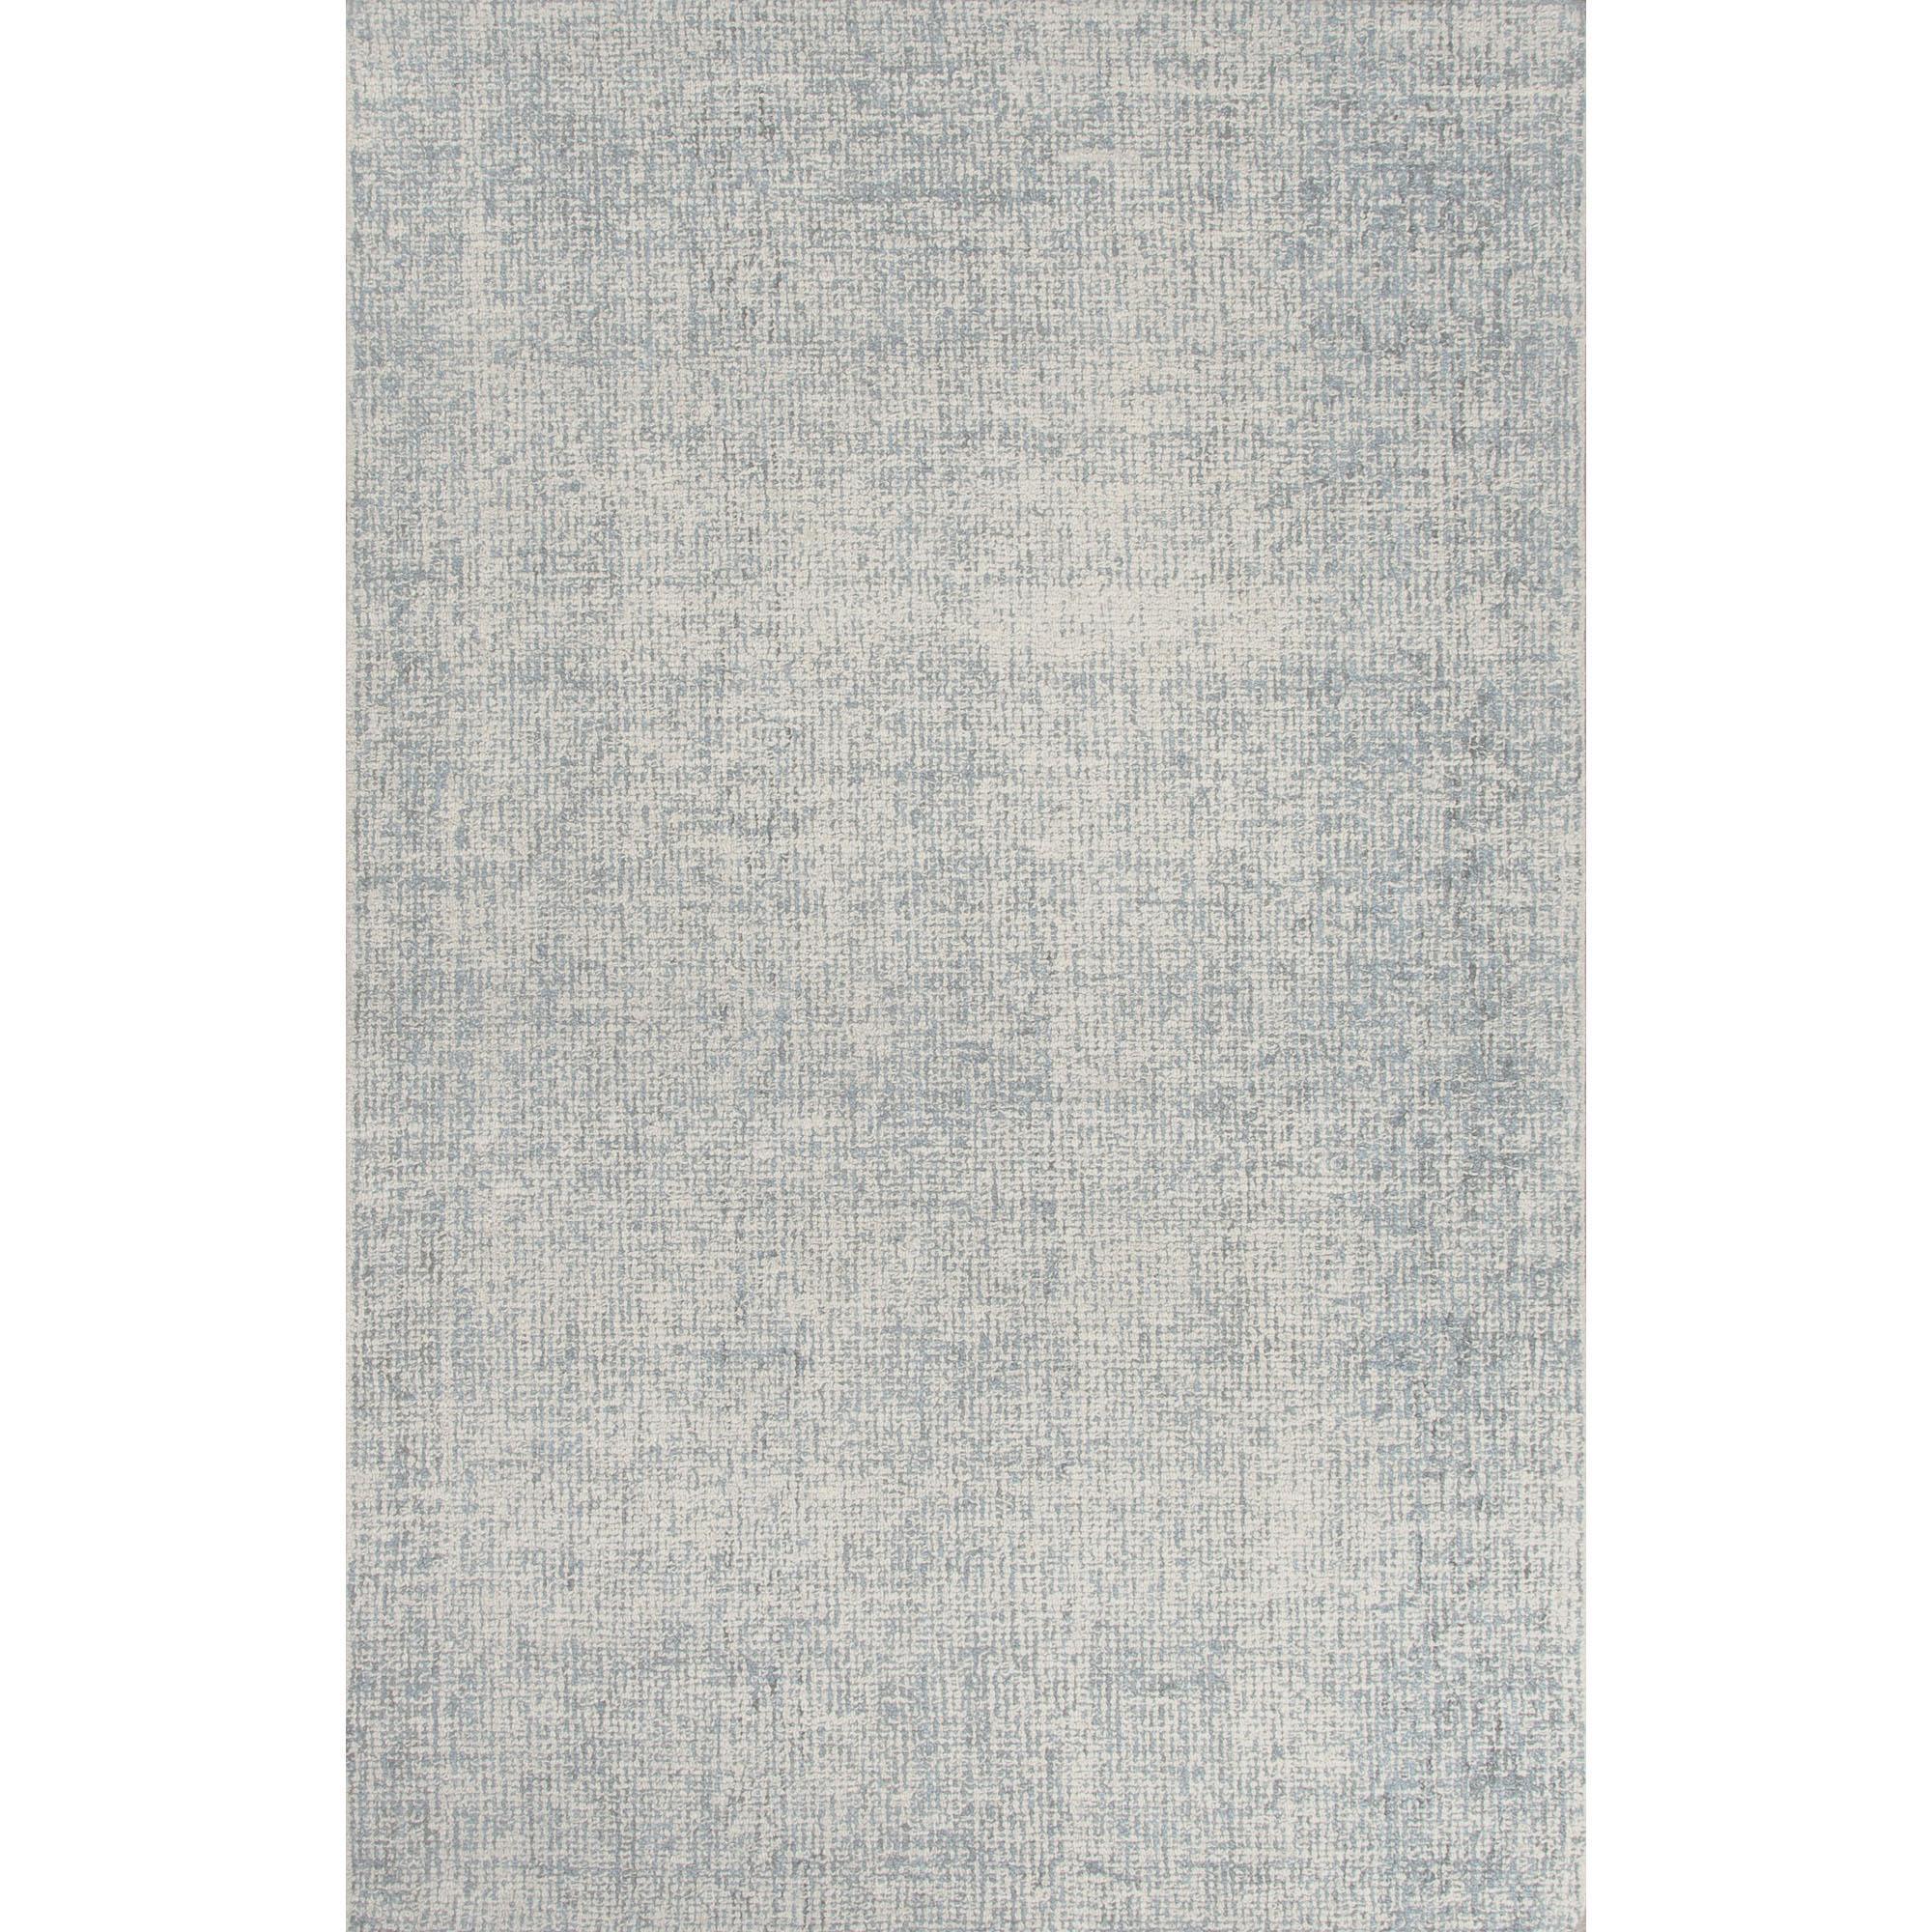 JAIPUR Rugs Britta 8 x 10 Rug - Item Number: RUG121980